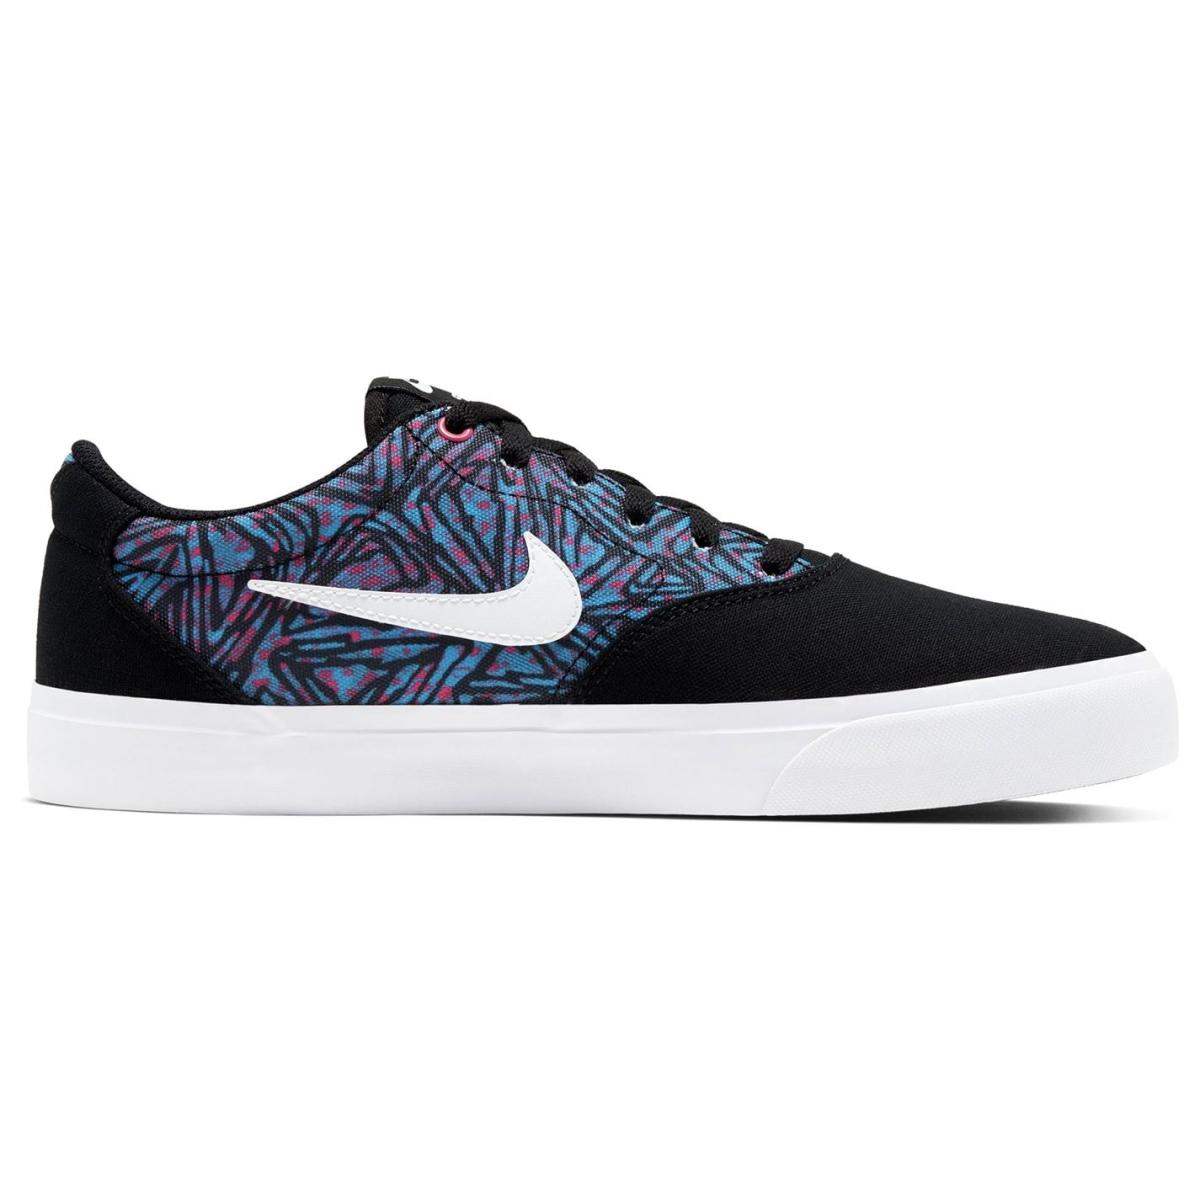 Nike-SB-Lot-Solarsoft-Skate-Chaussures-Messieurs-Skater-Chaussures-De-Sport-Skate-2162 miniature 23